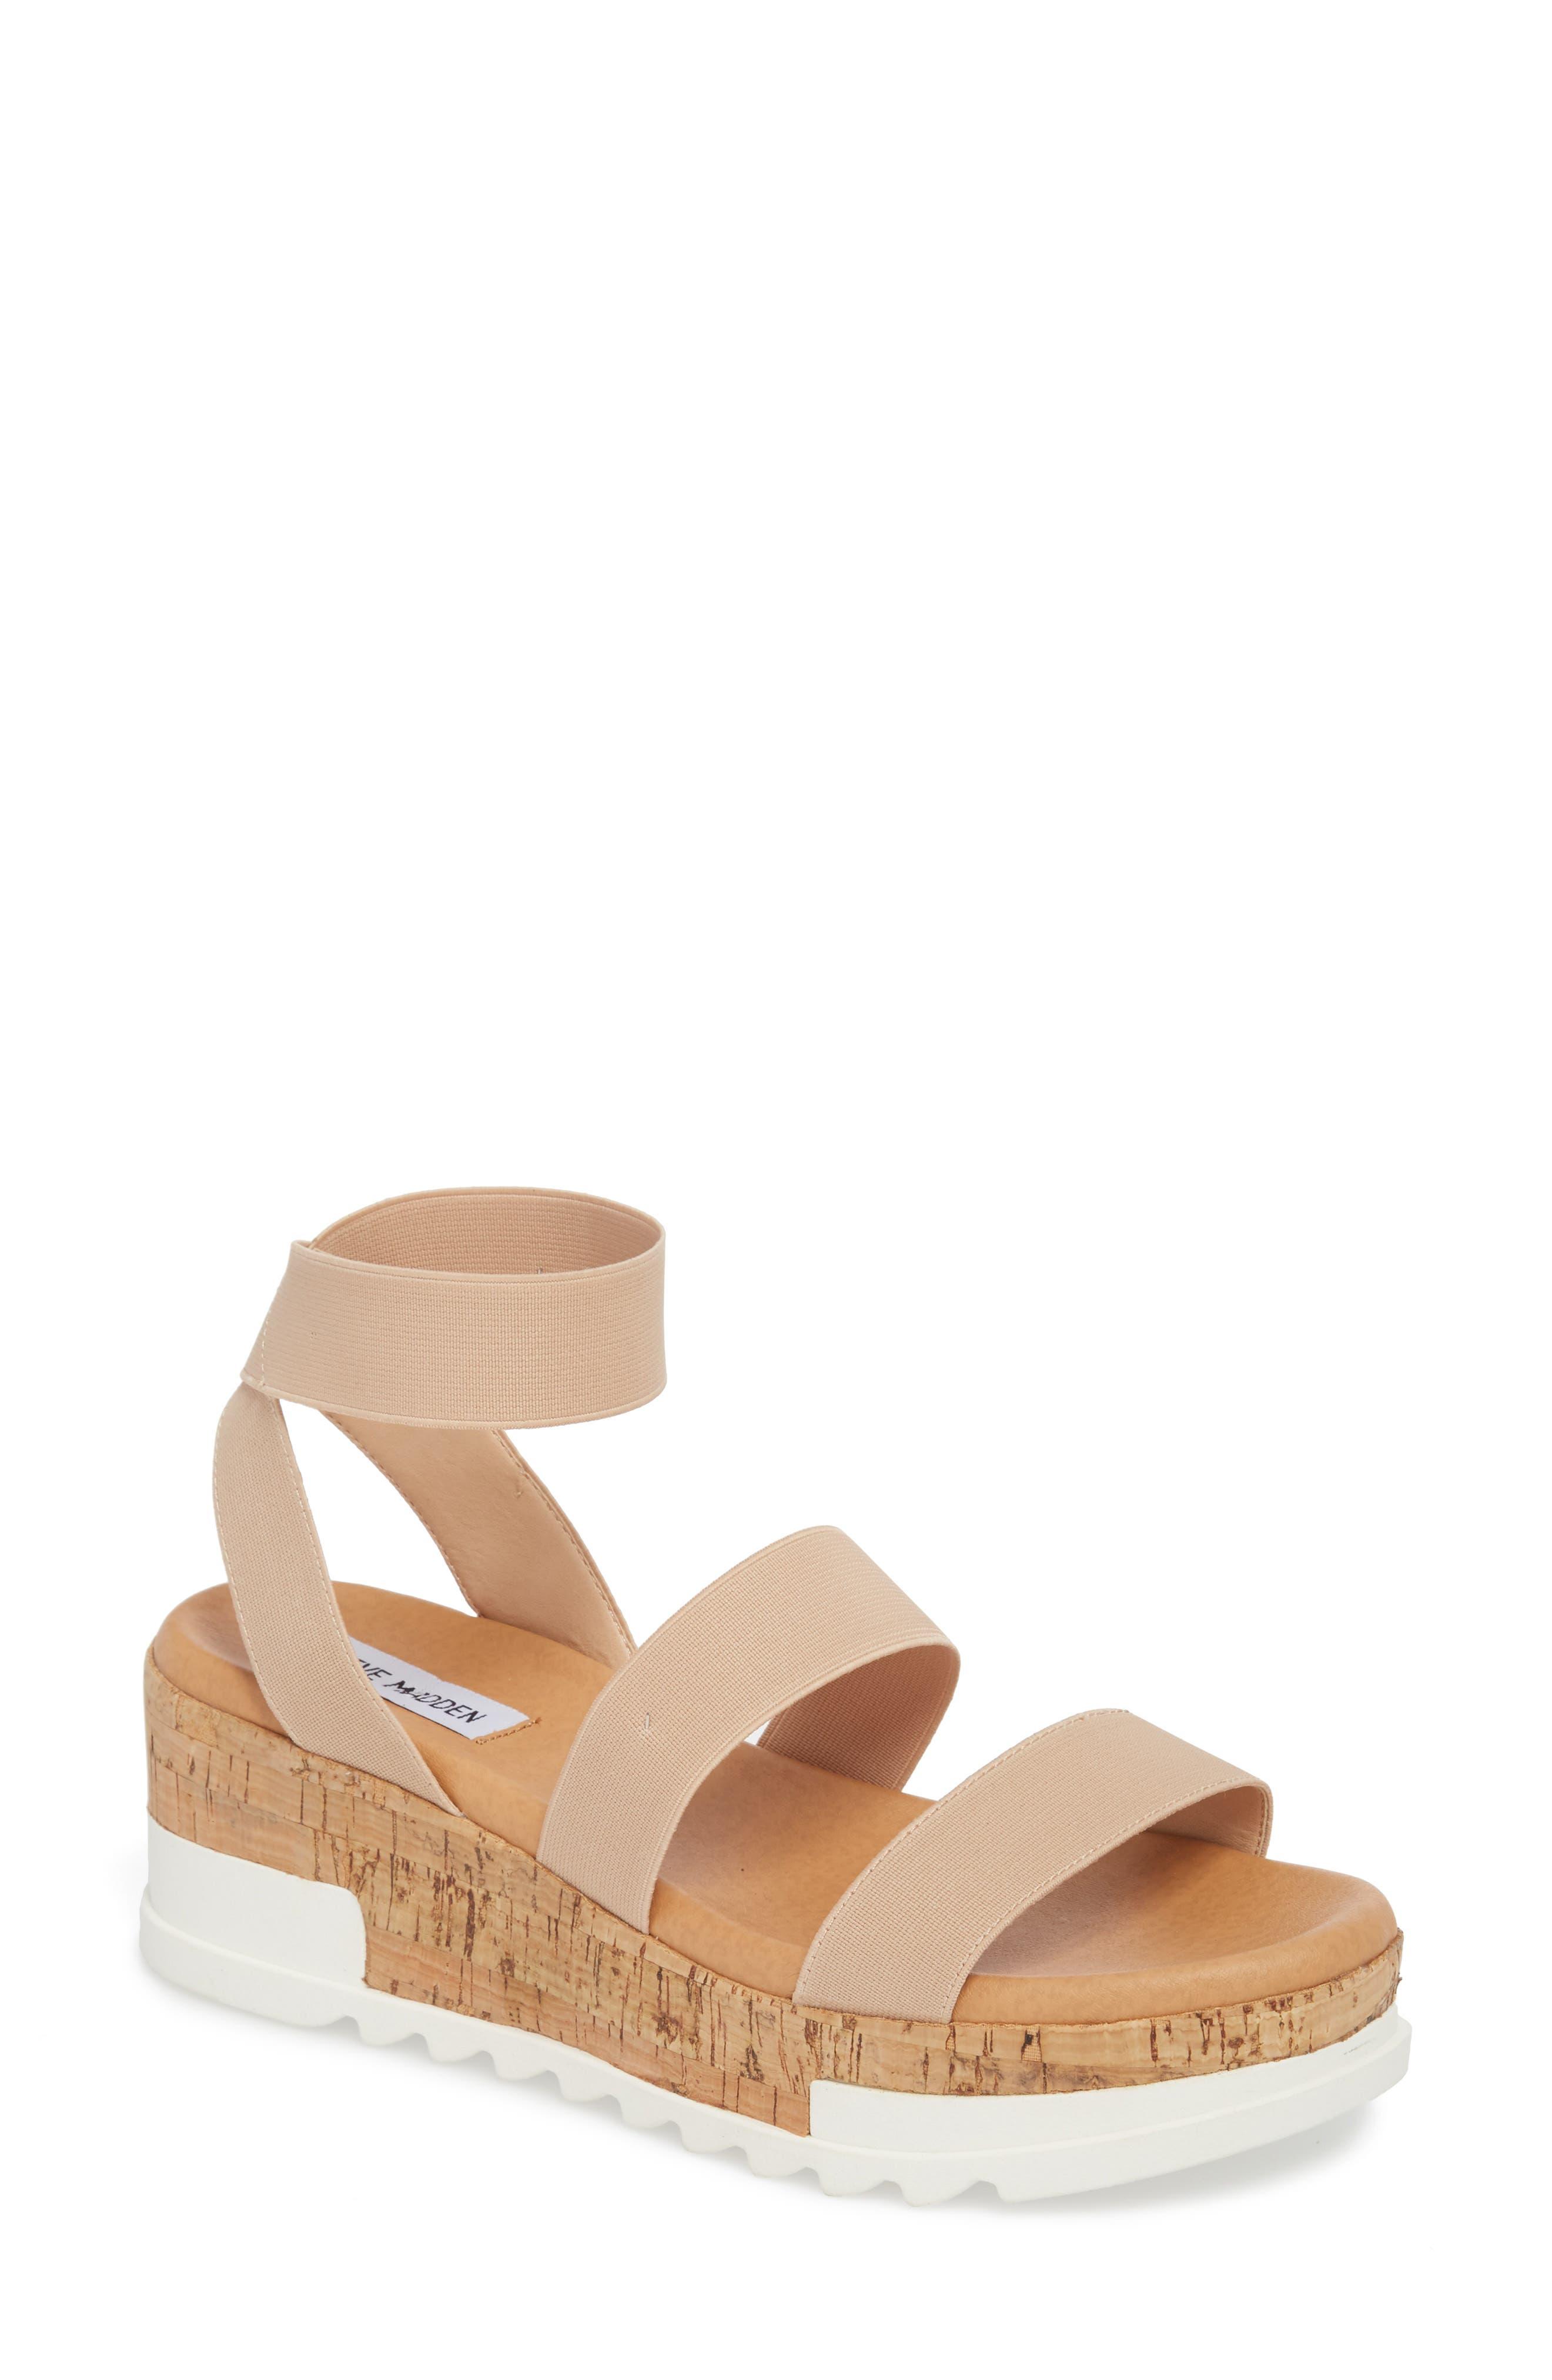 Bandi Platform Wedge Sandal,                         Main,                         color, BLUSH